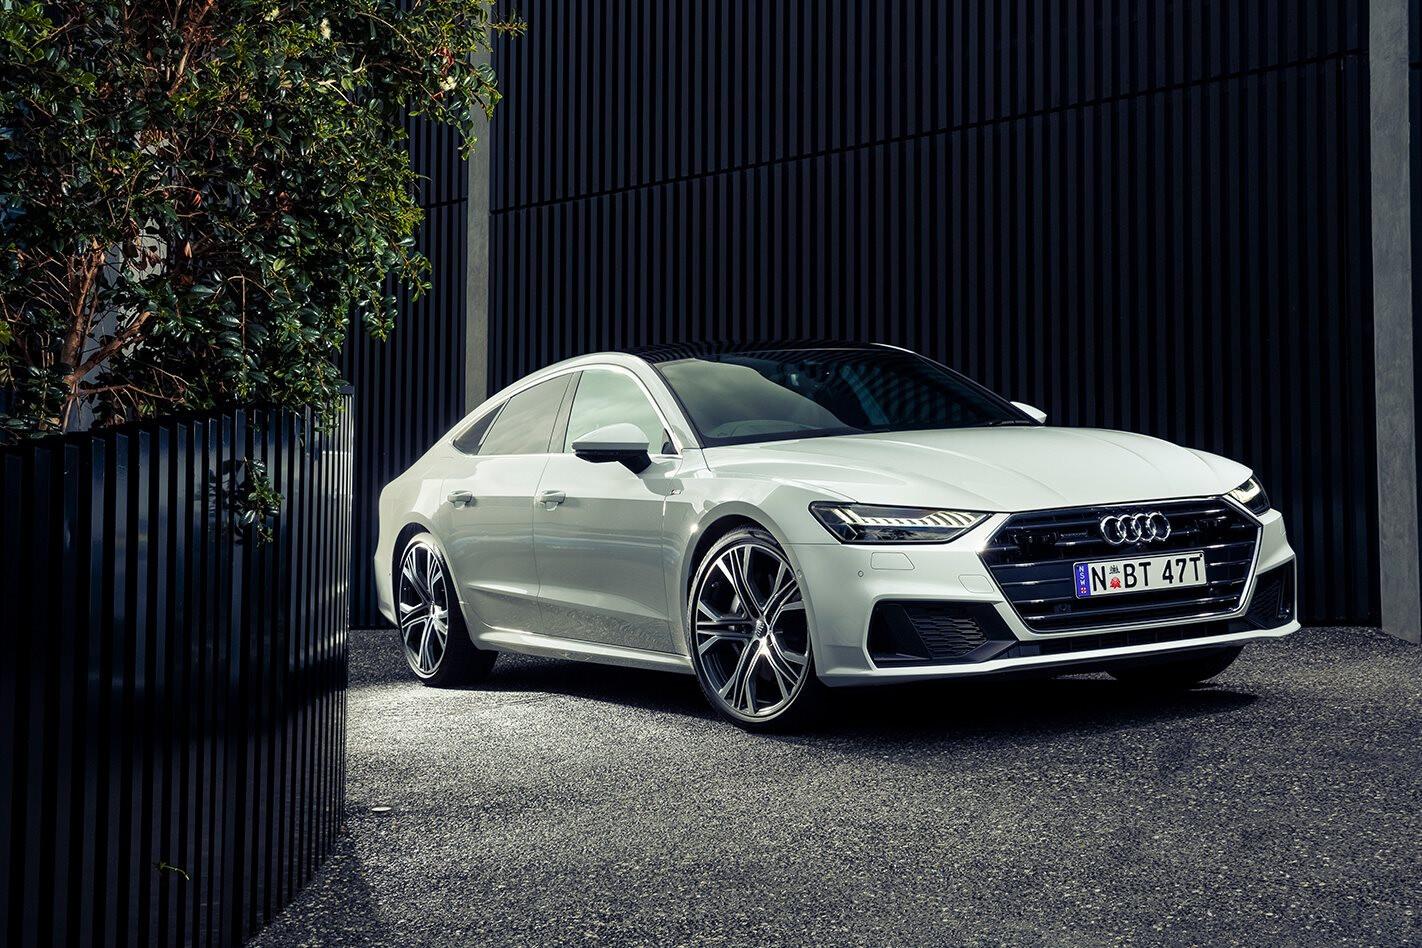 Audi A 7 Lead Jpg